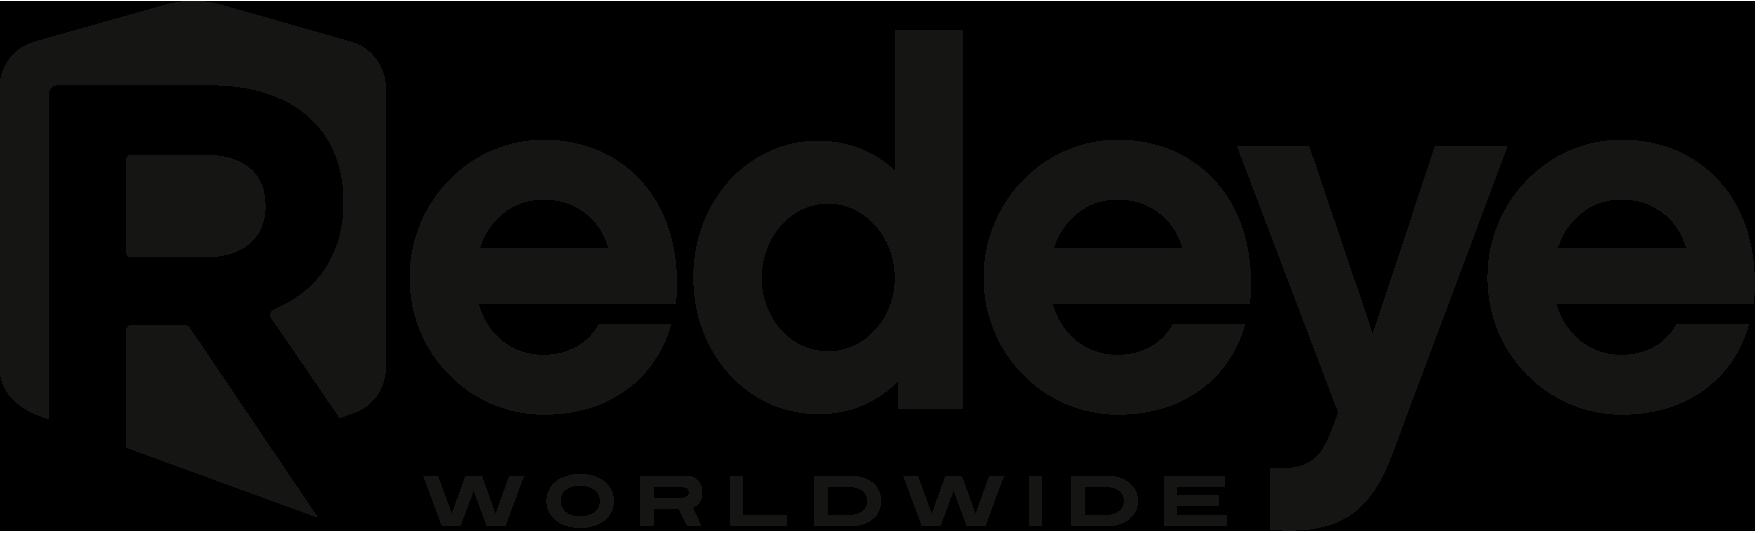 redeye_logo_black